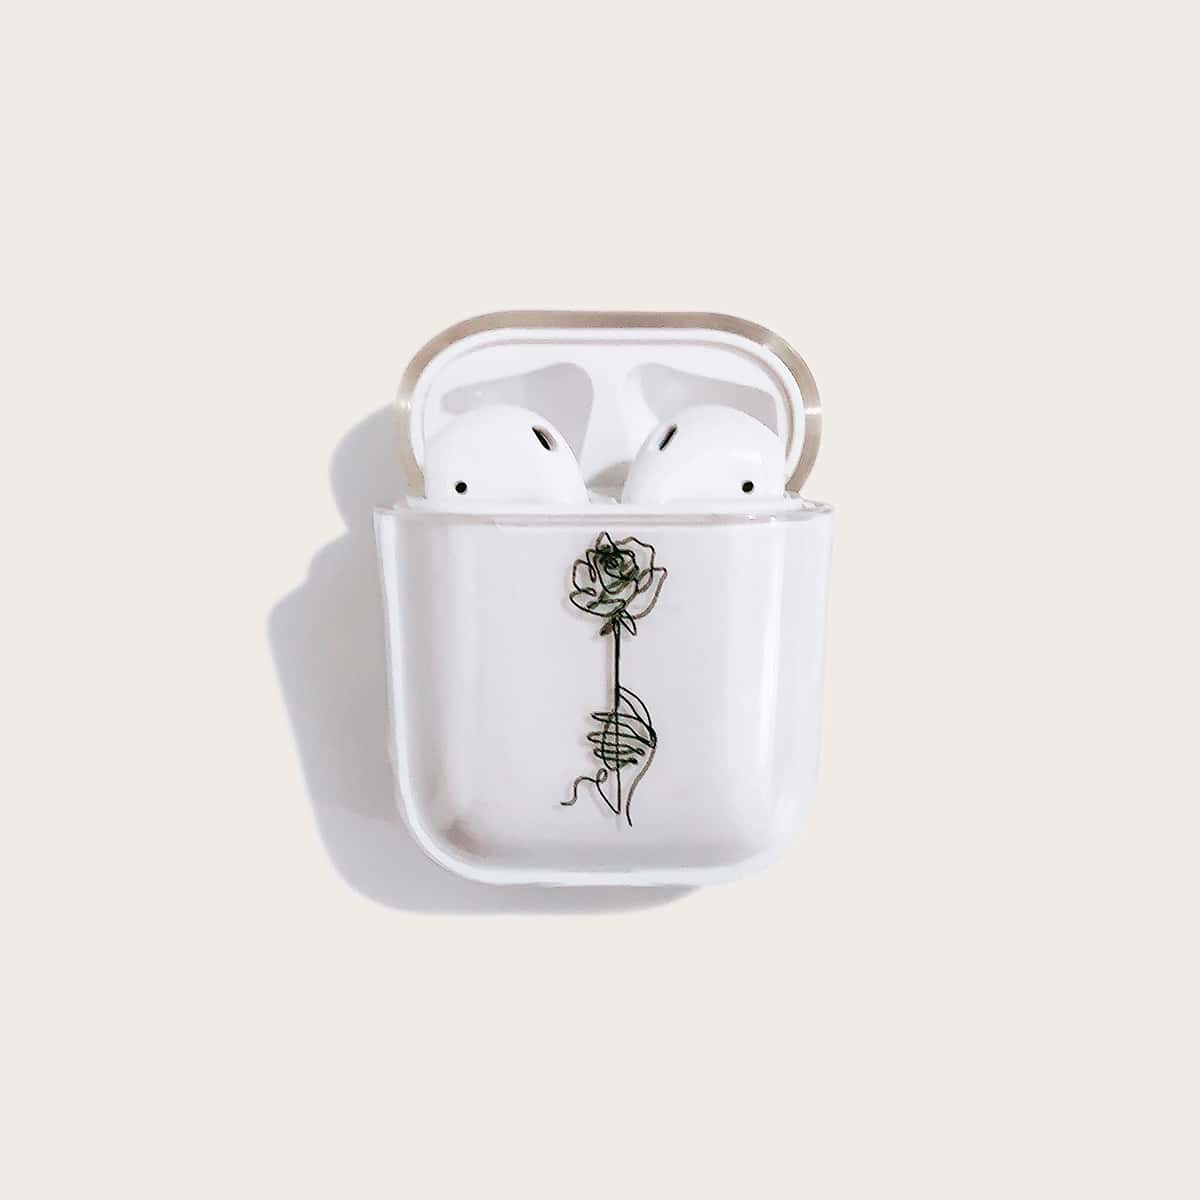 SHEIN / 1 Stück Transparente Airpods Hülle mit Rose Muster